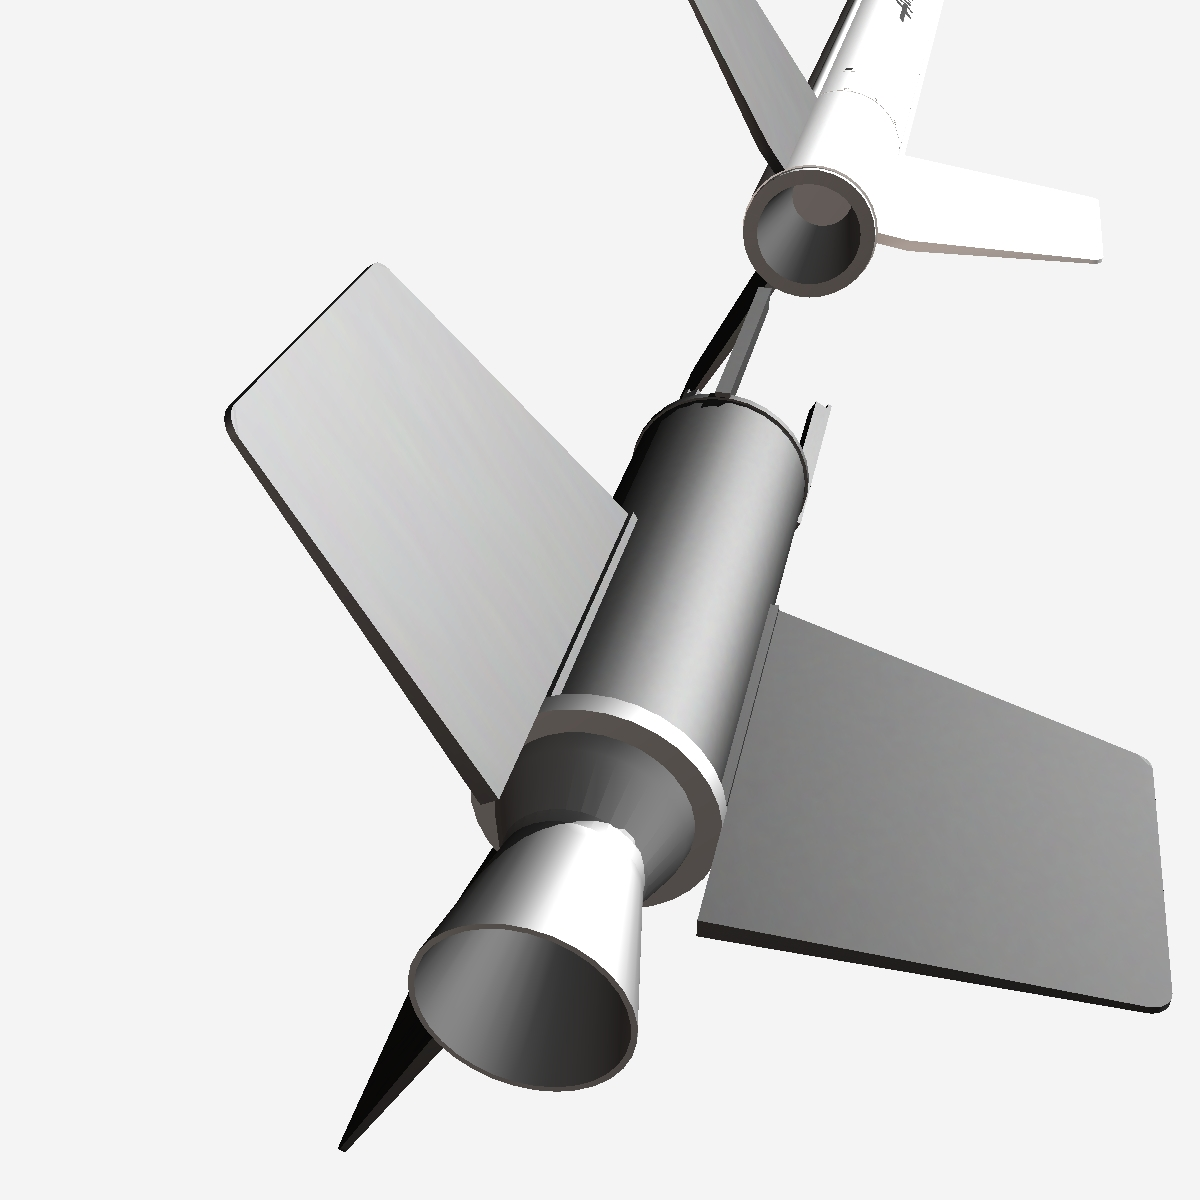 nasa aerobee 100 rocket 3d model 3ds dxf fbx blend cob dae x  obj 158443